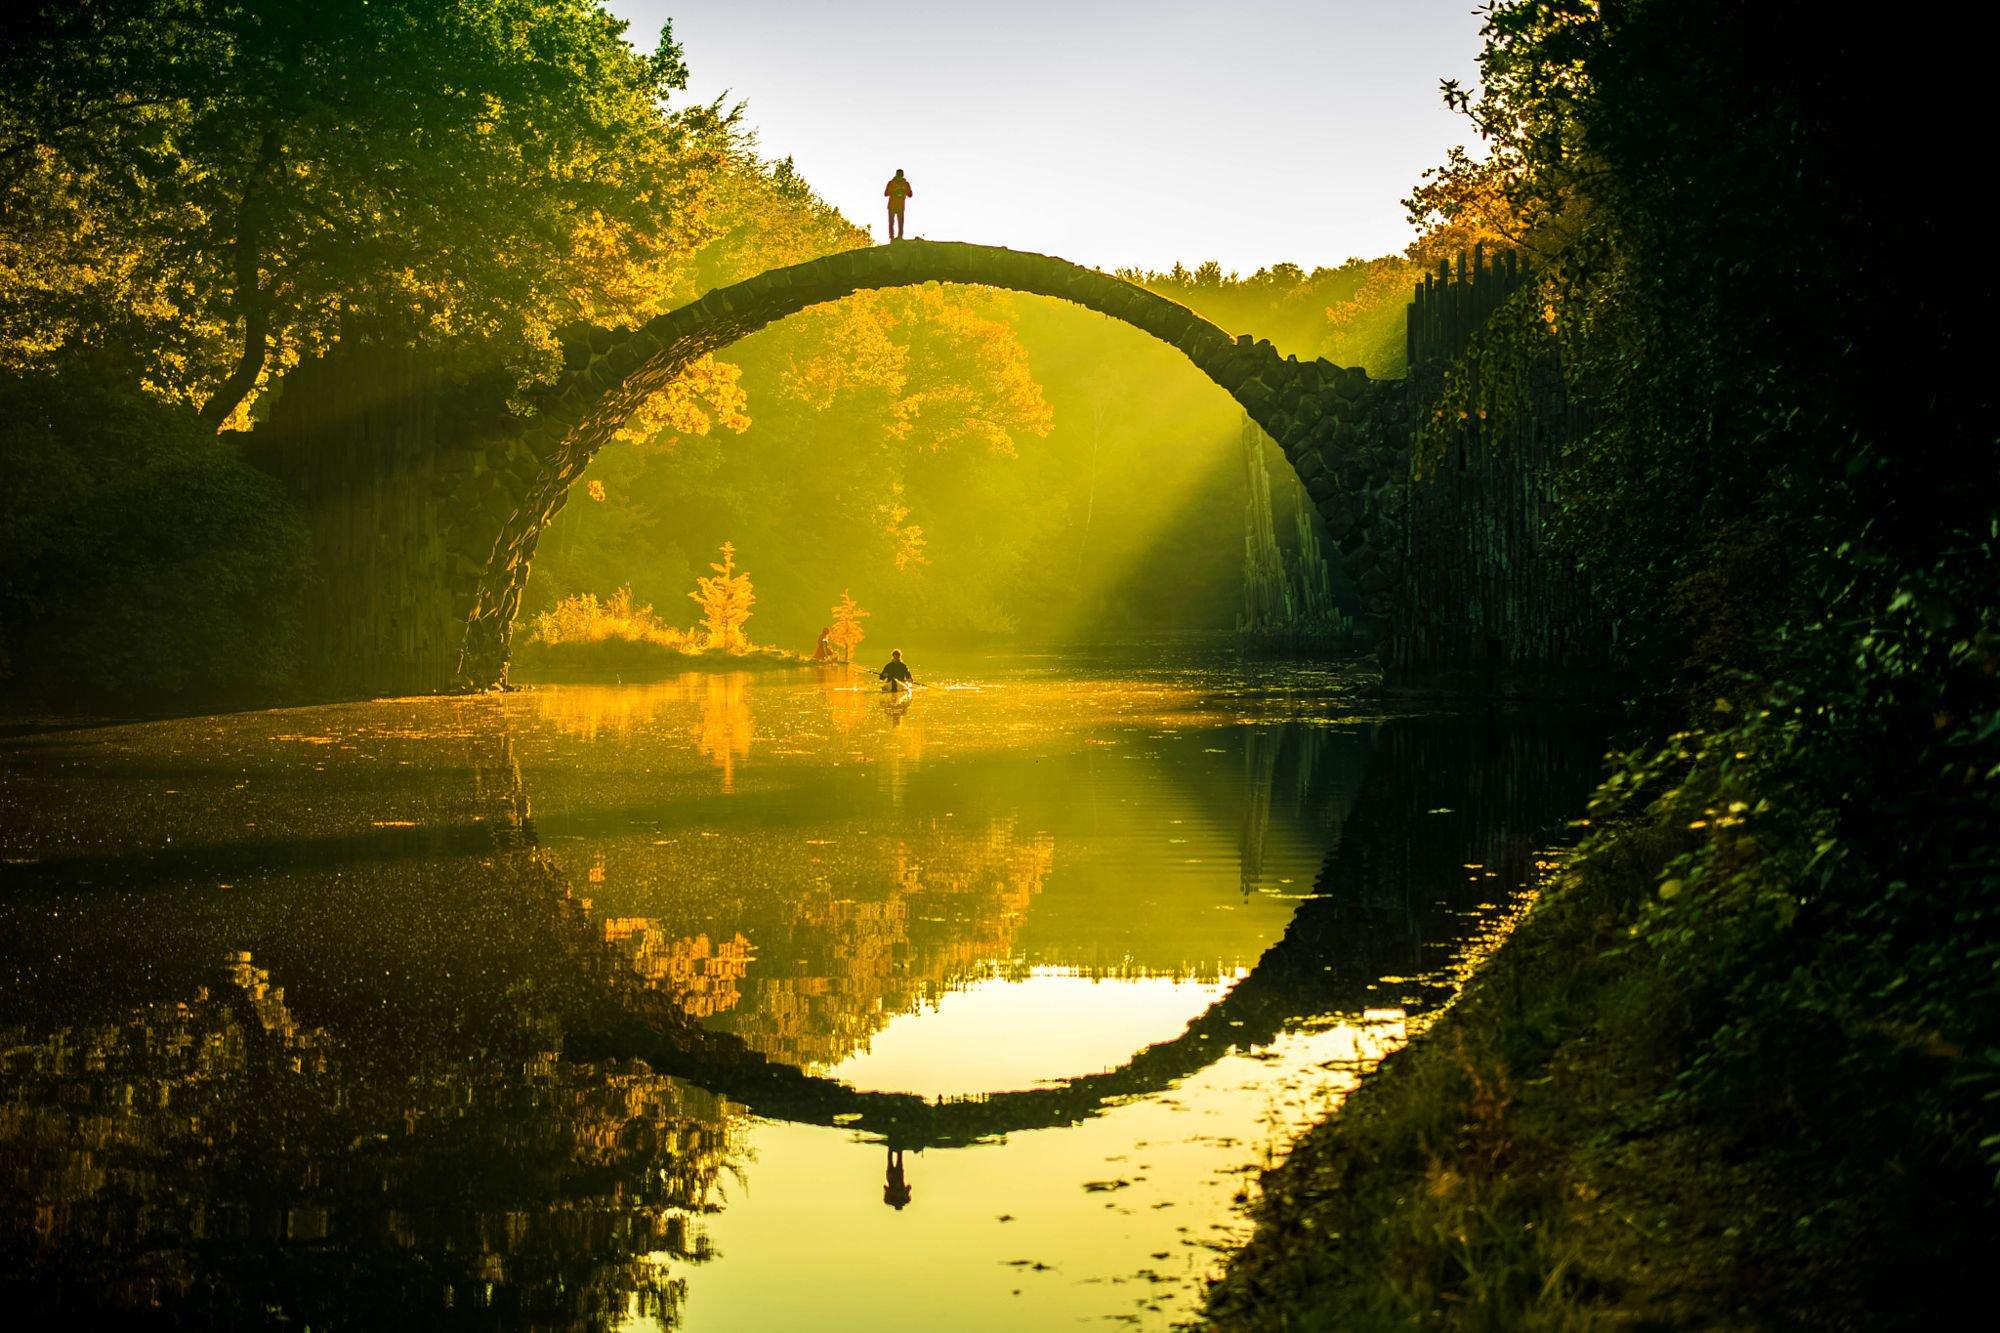 Bridge reflection photo